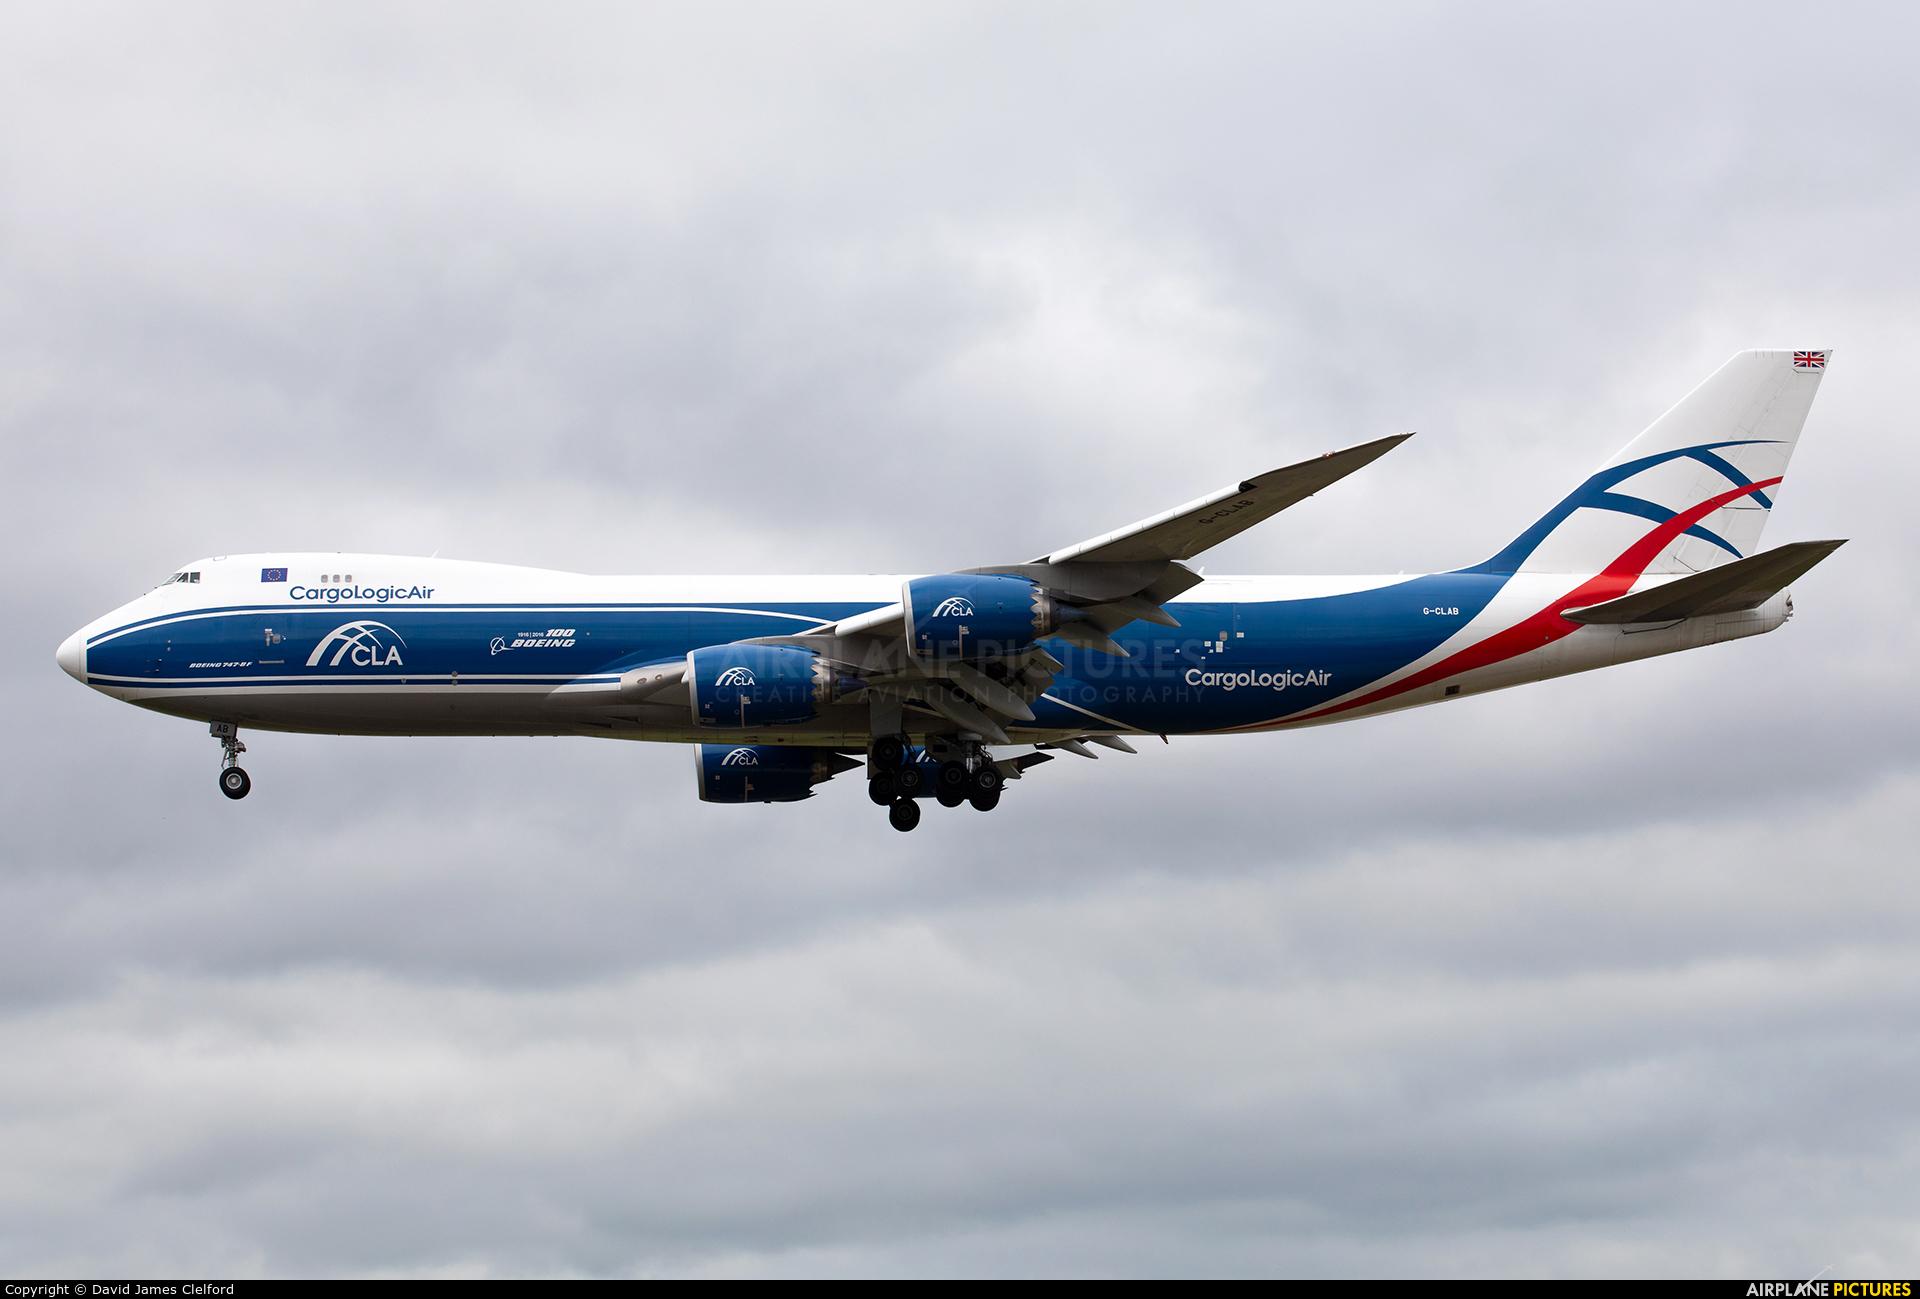 Cargologicair G-CLAB aircraft at Frankfurt